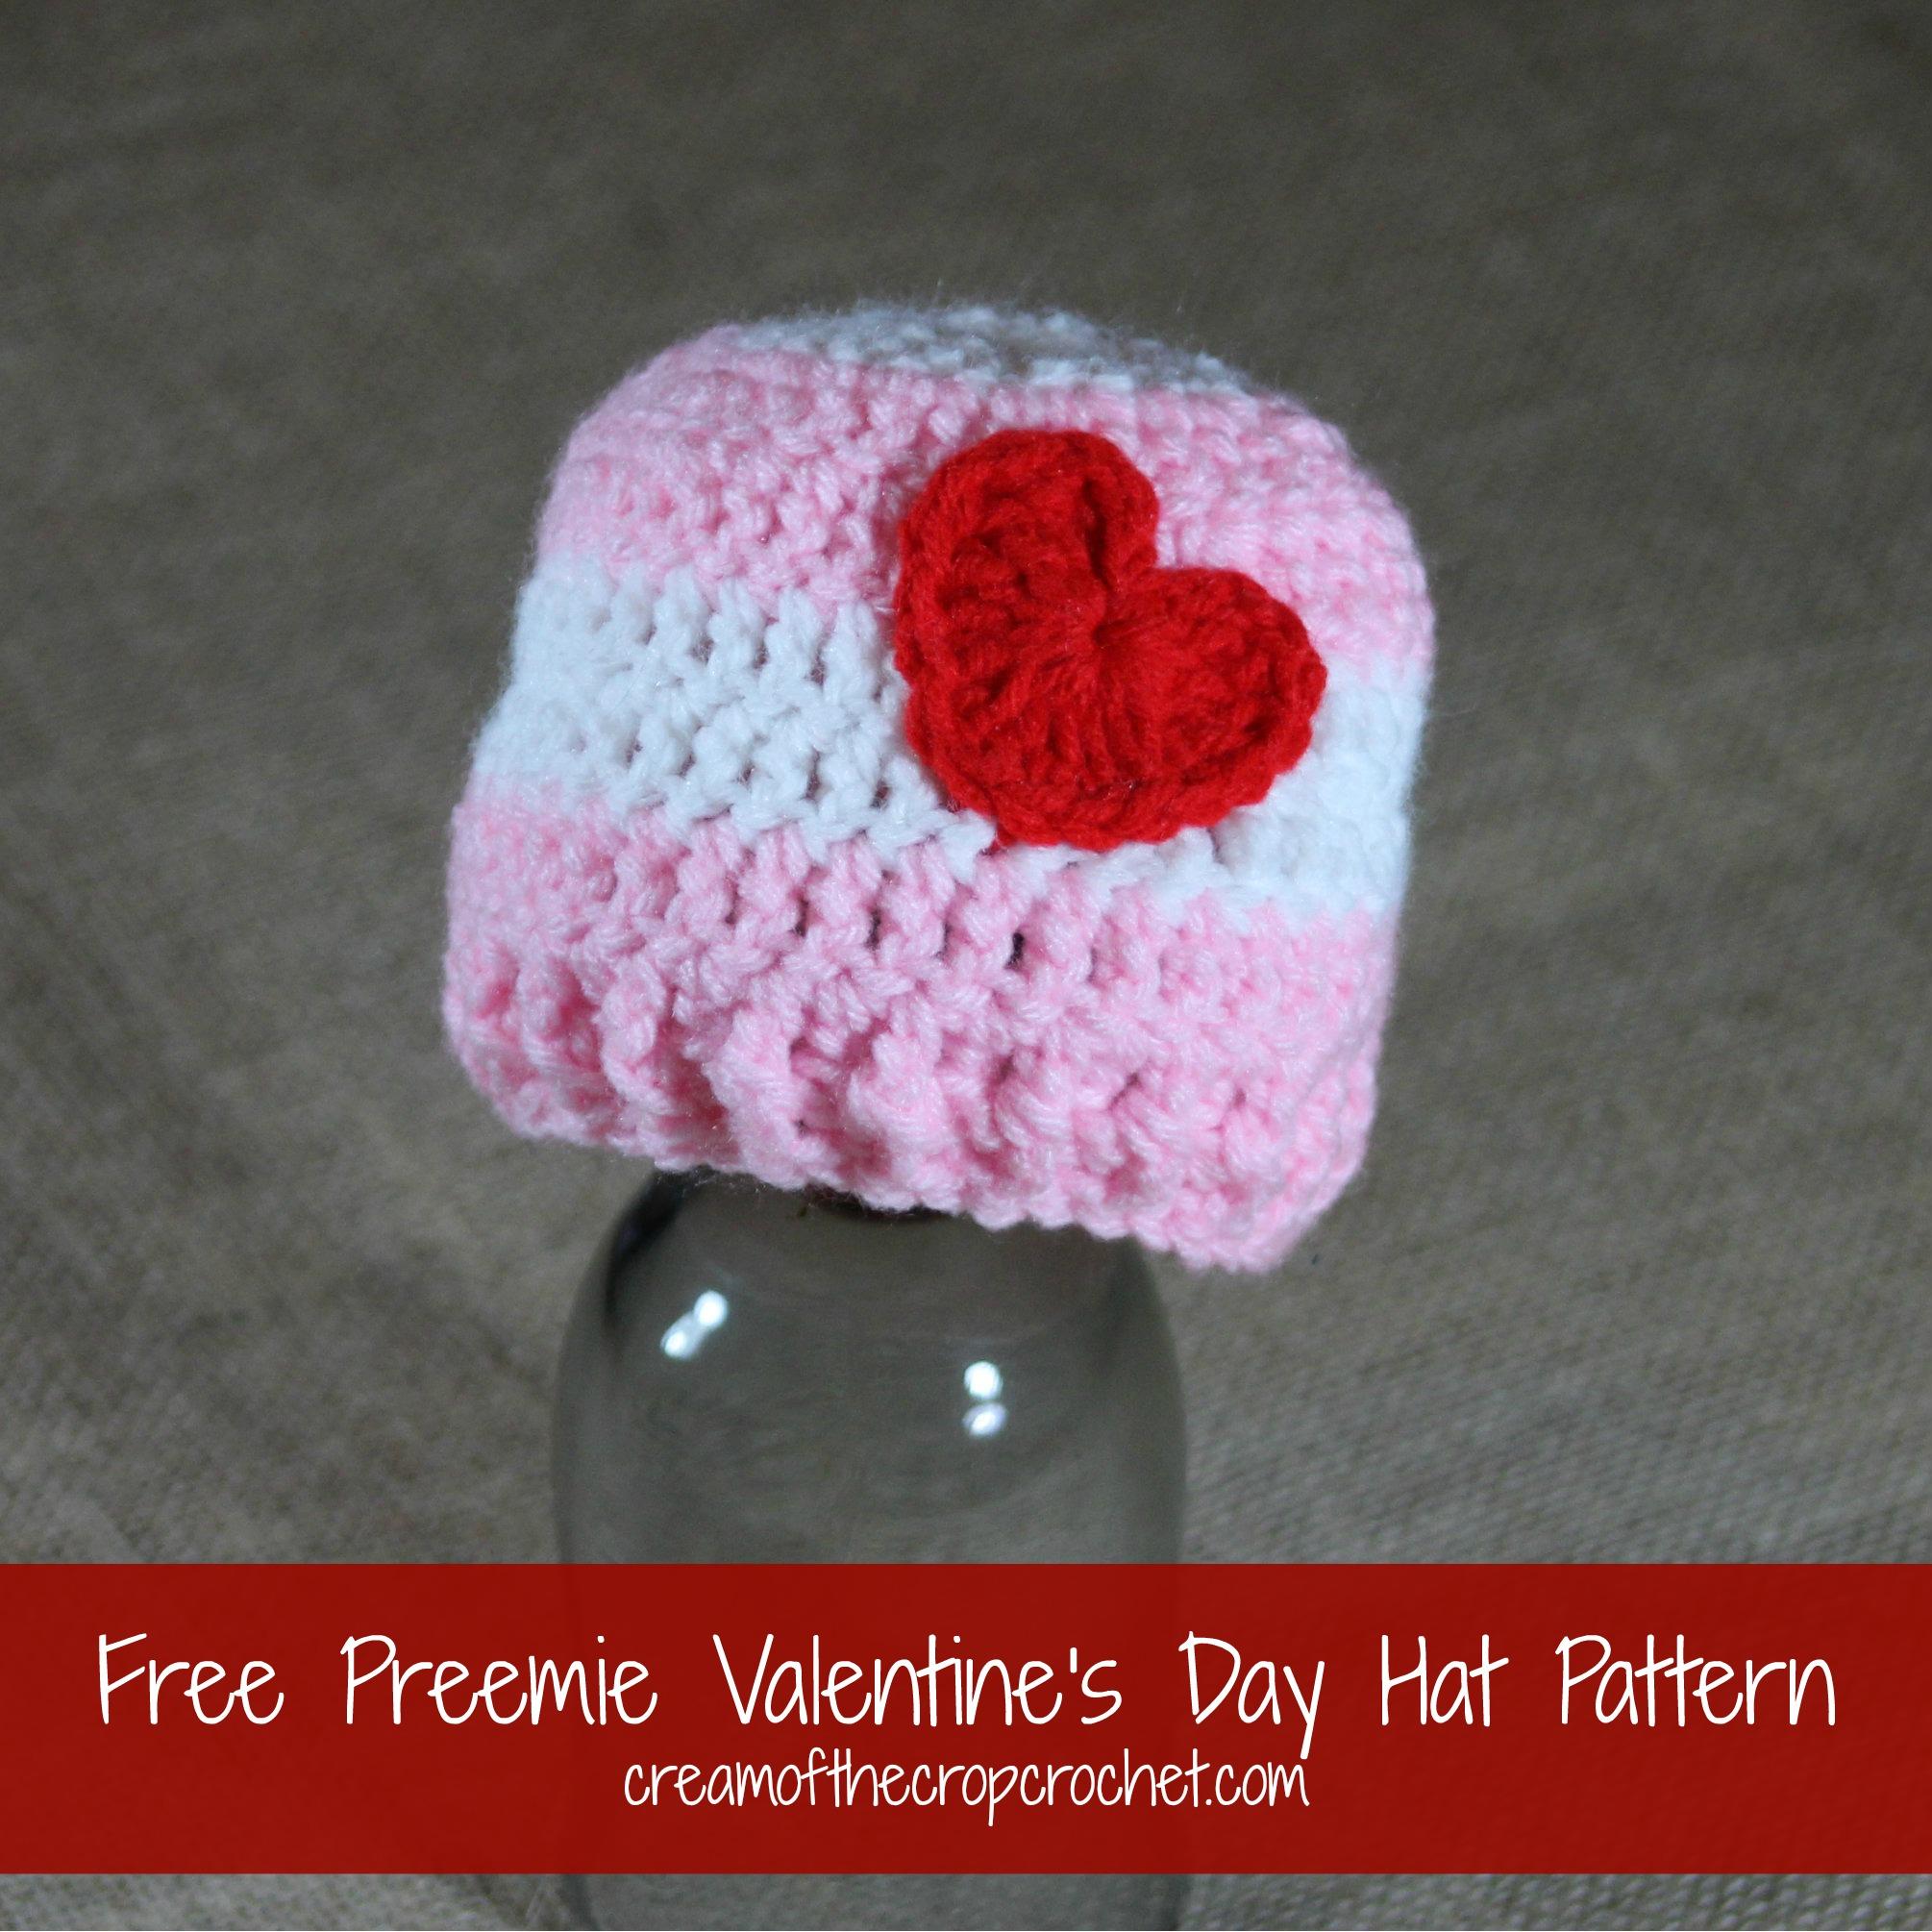 Cream Of The Crop Crochet ~ Preemie Valentine's Day Hat {Free Crochet Pattern}